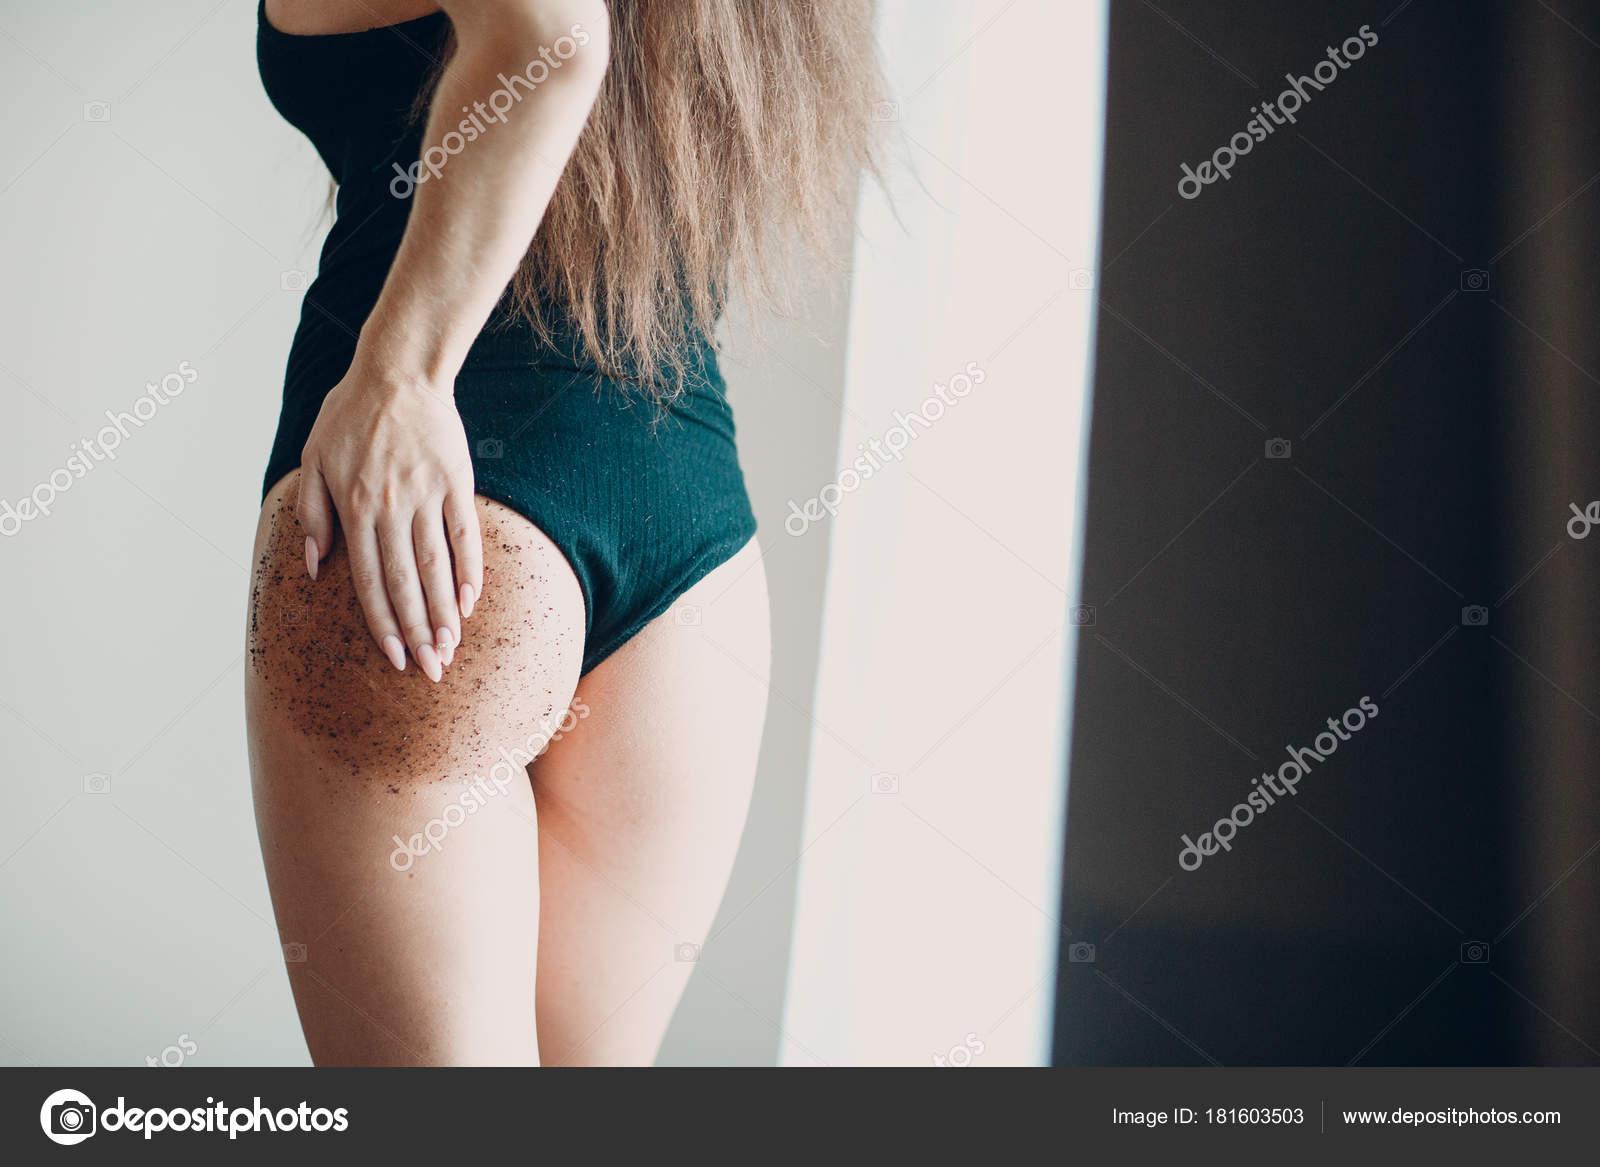 Saber reccomend Female hairy butt pics